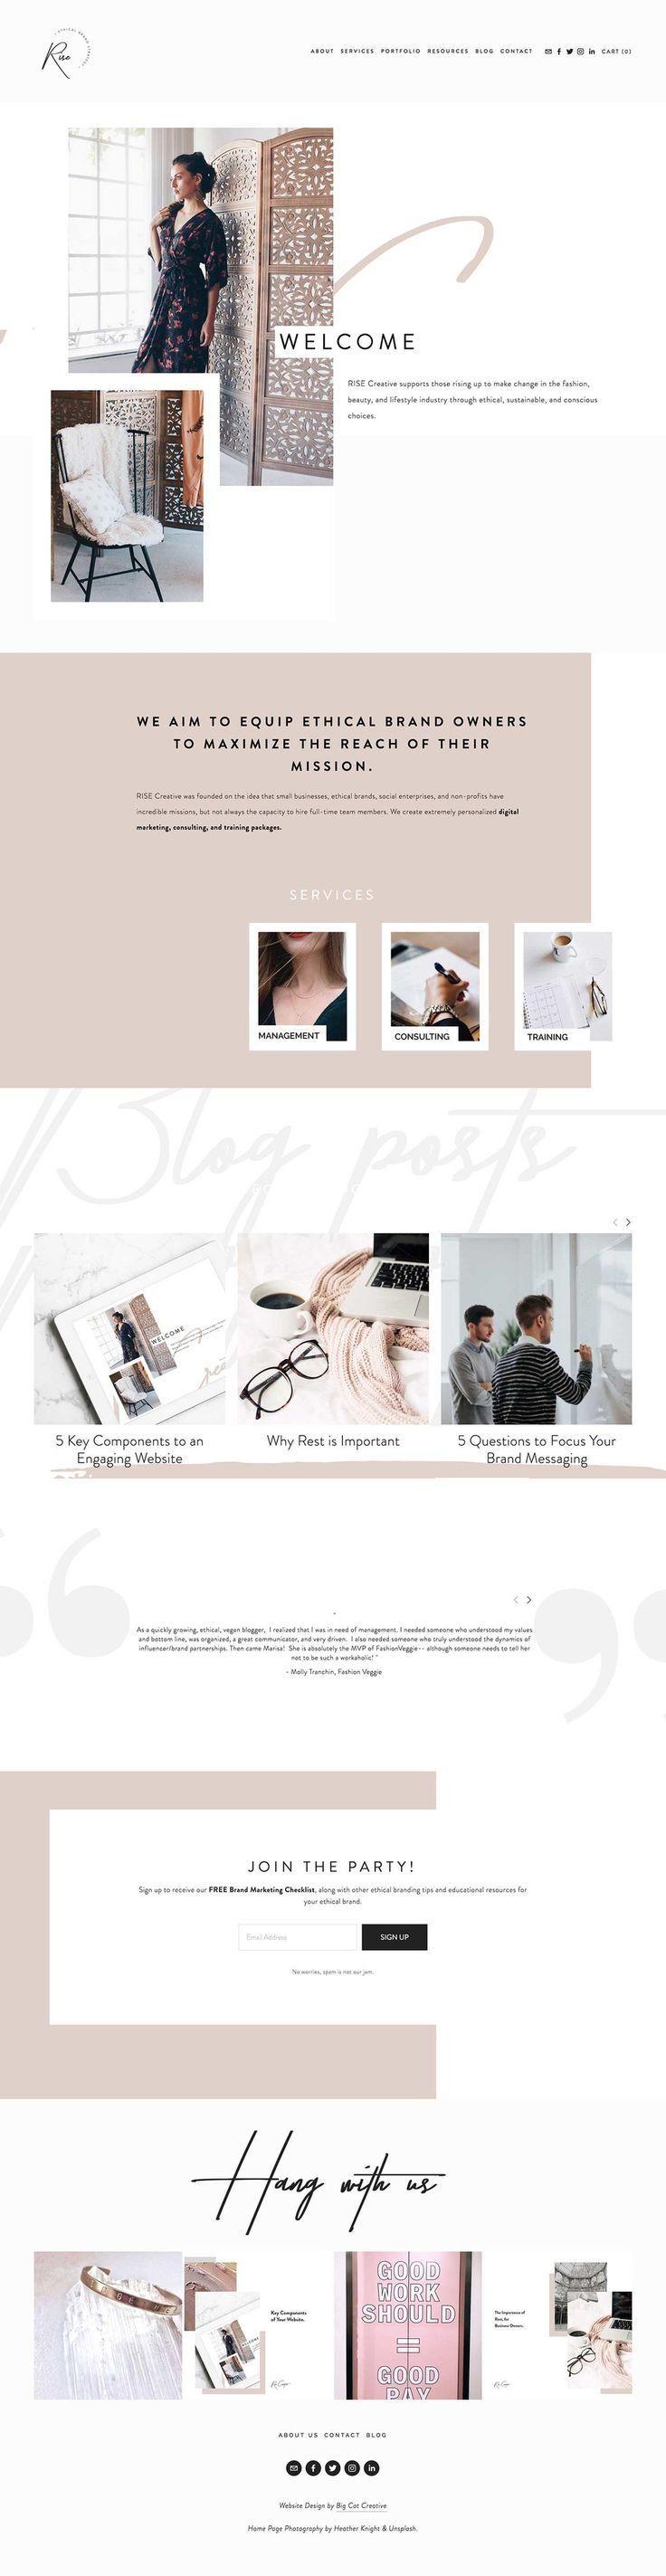 Squarespace Template Showcase Rise Creative Co Web Design Inspiration Web Design Inspiration Website Design Inspiration Design